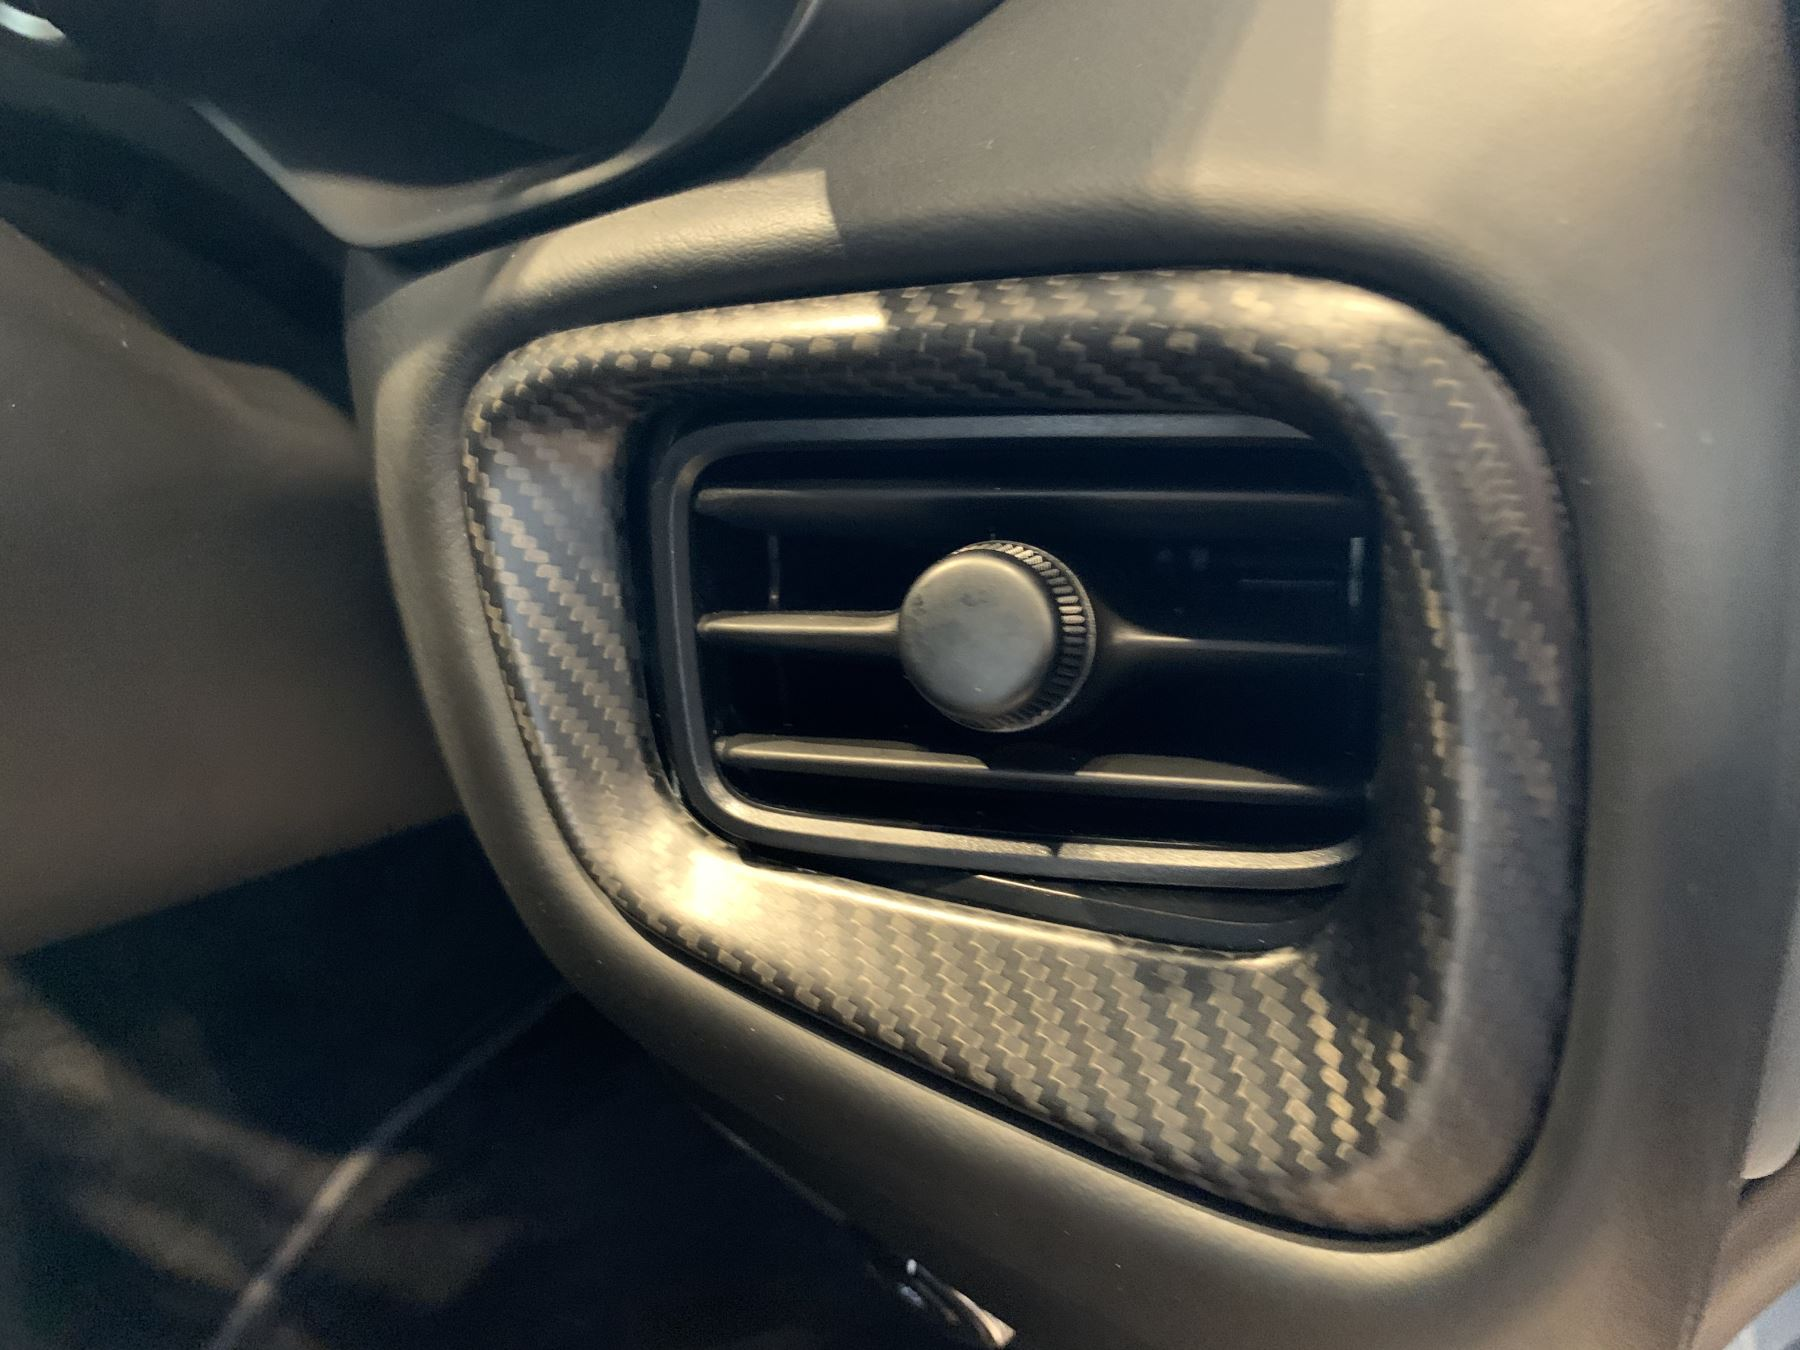 Aston Martin New Vantage 2dr ZF 8 Speed image 27